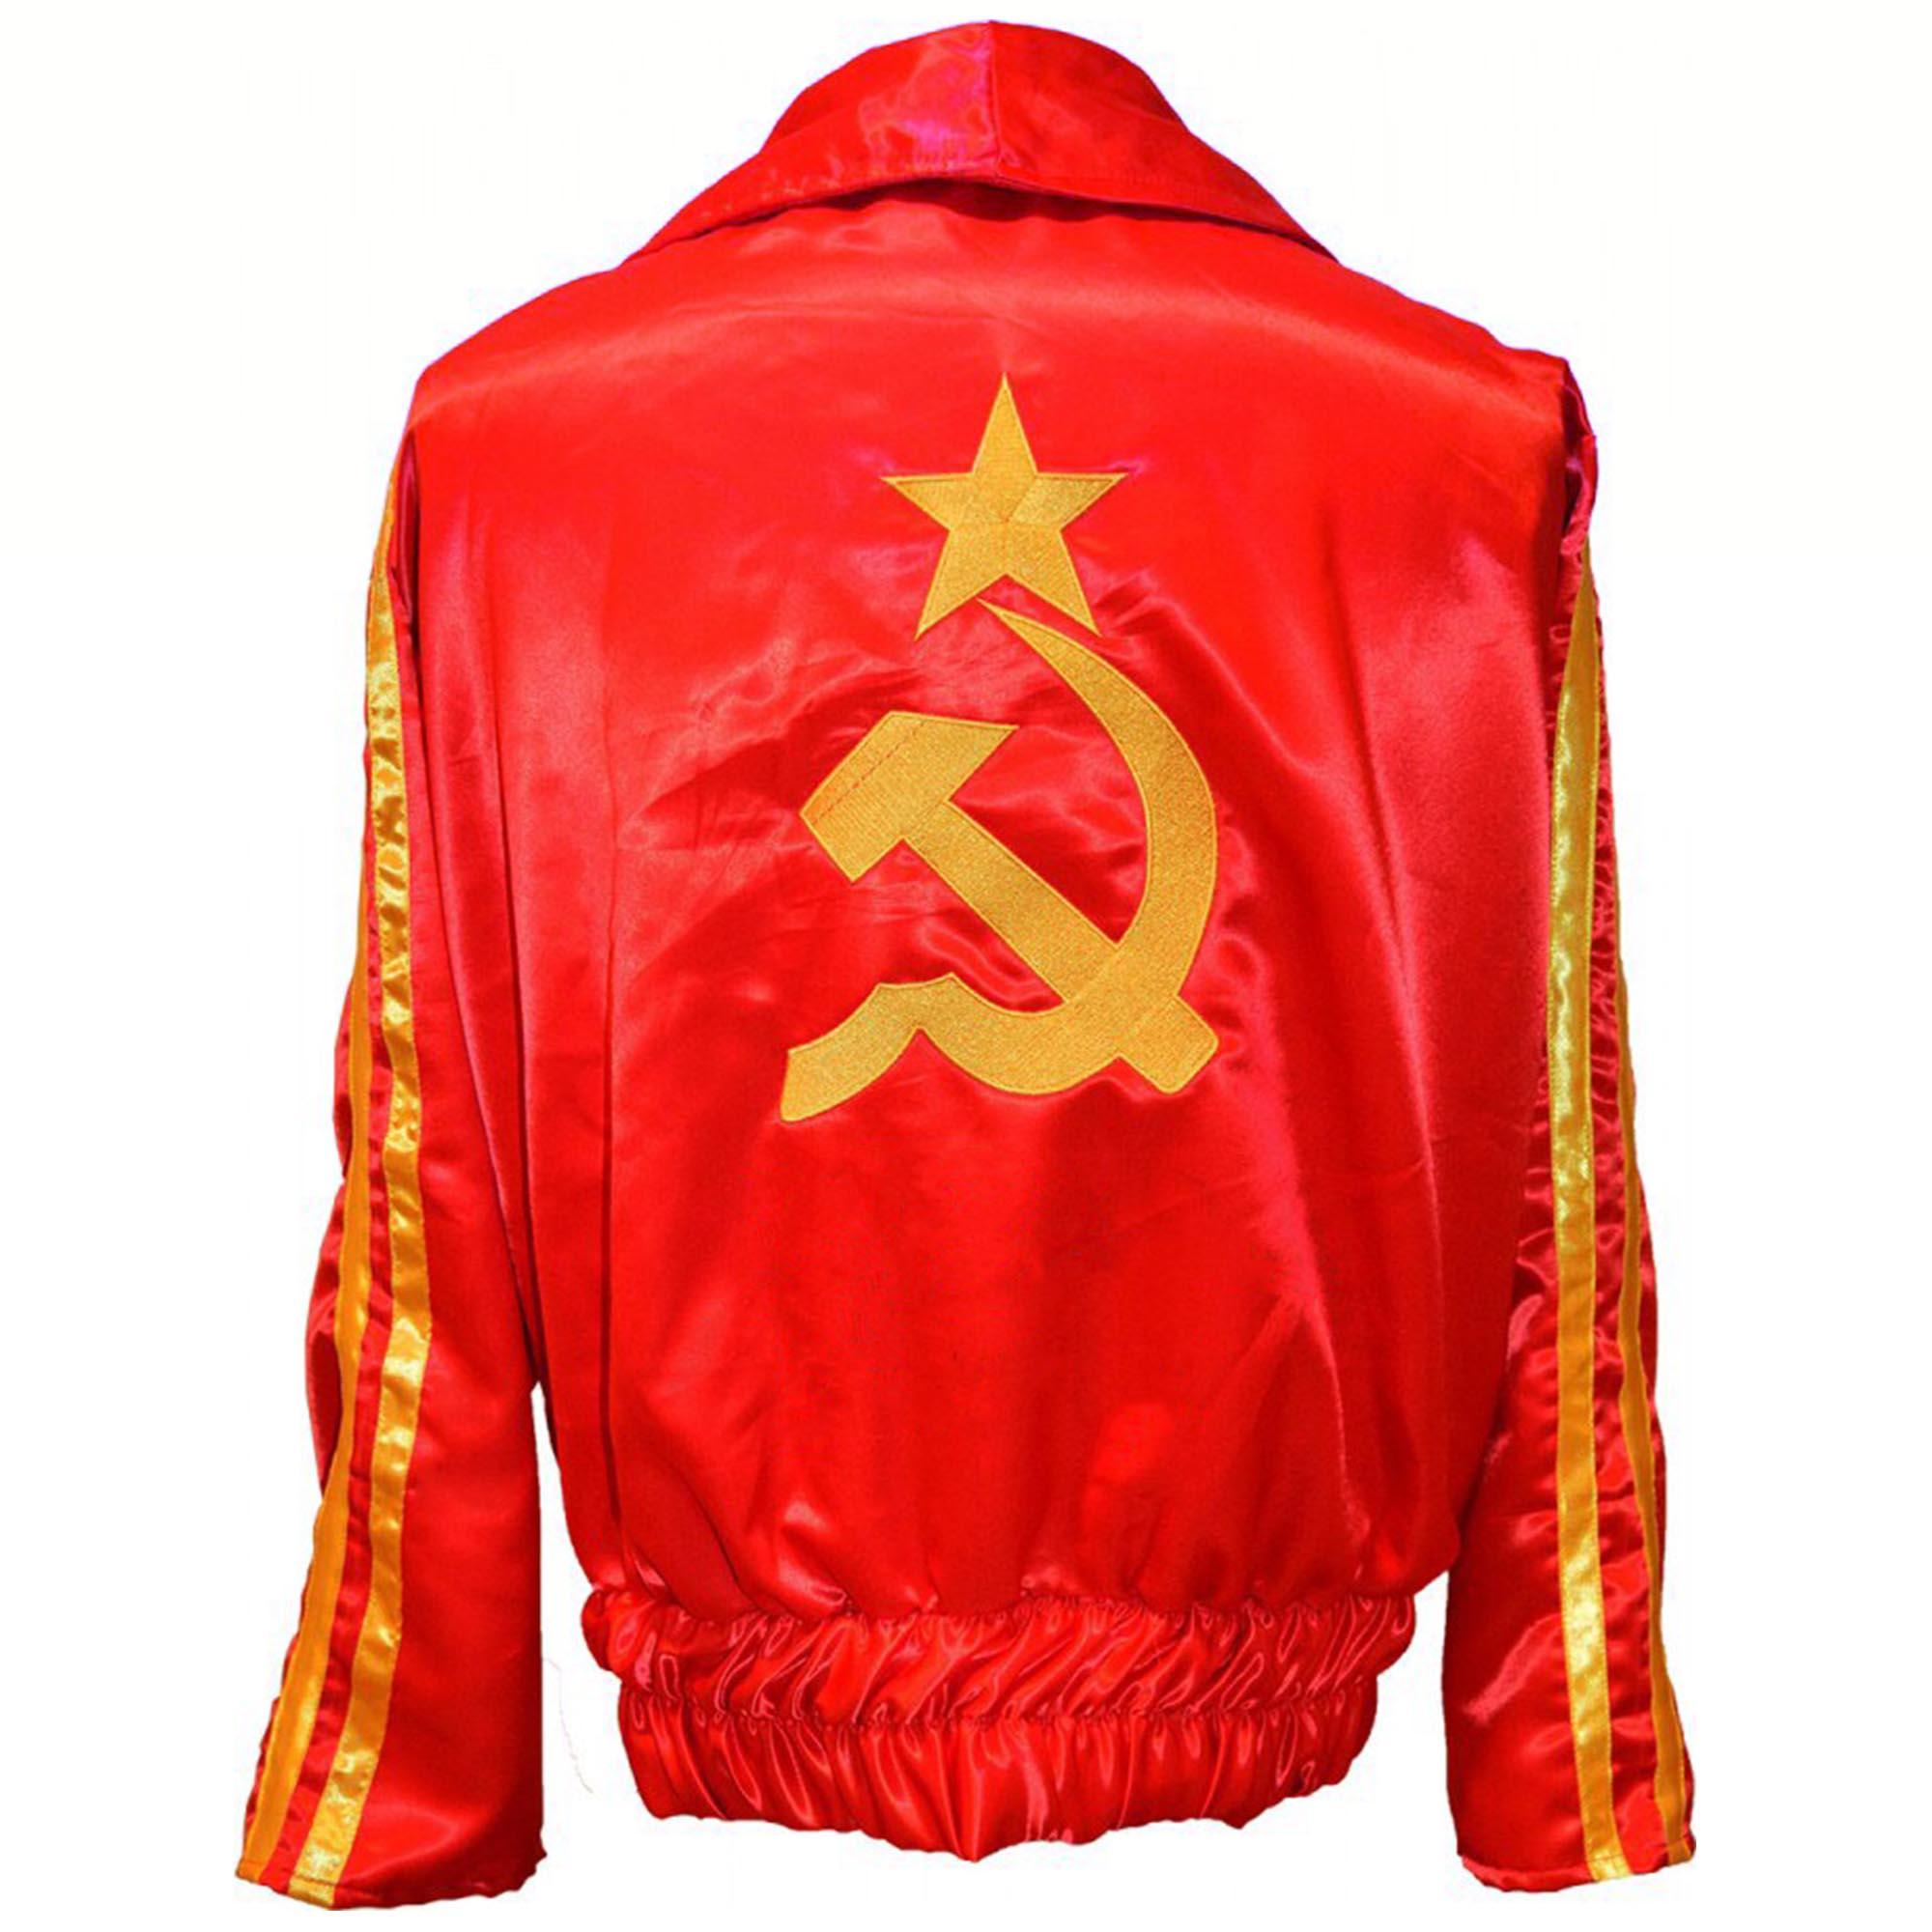 Ivan Drago Rocky IV Ring Jacket